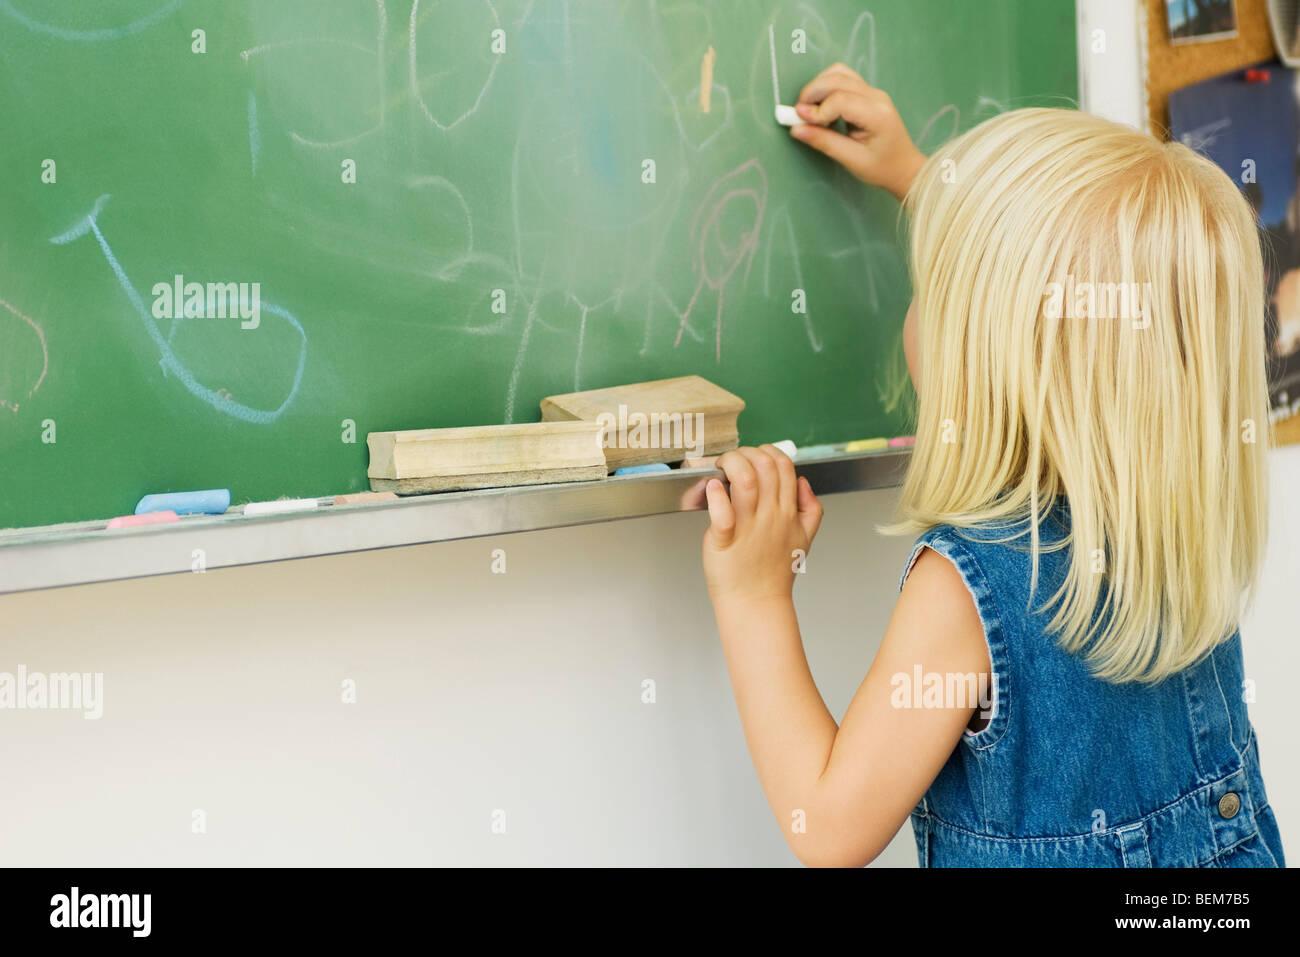 Little girl drawing on blackboard - Stock Image